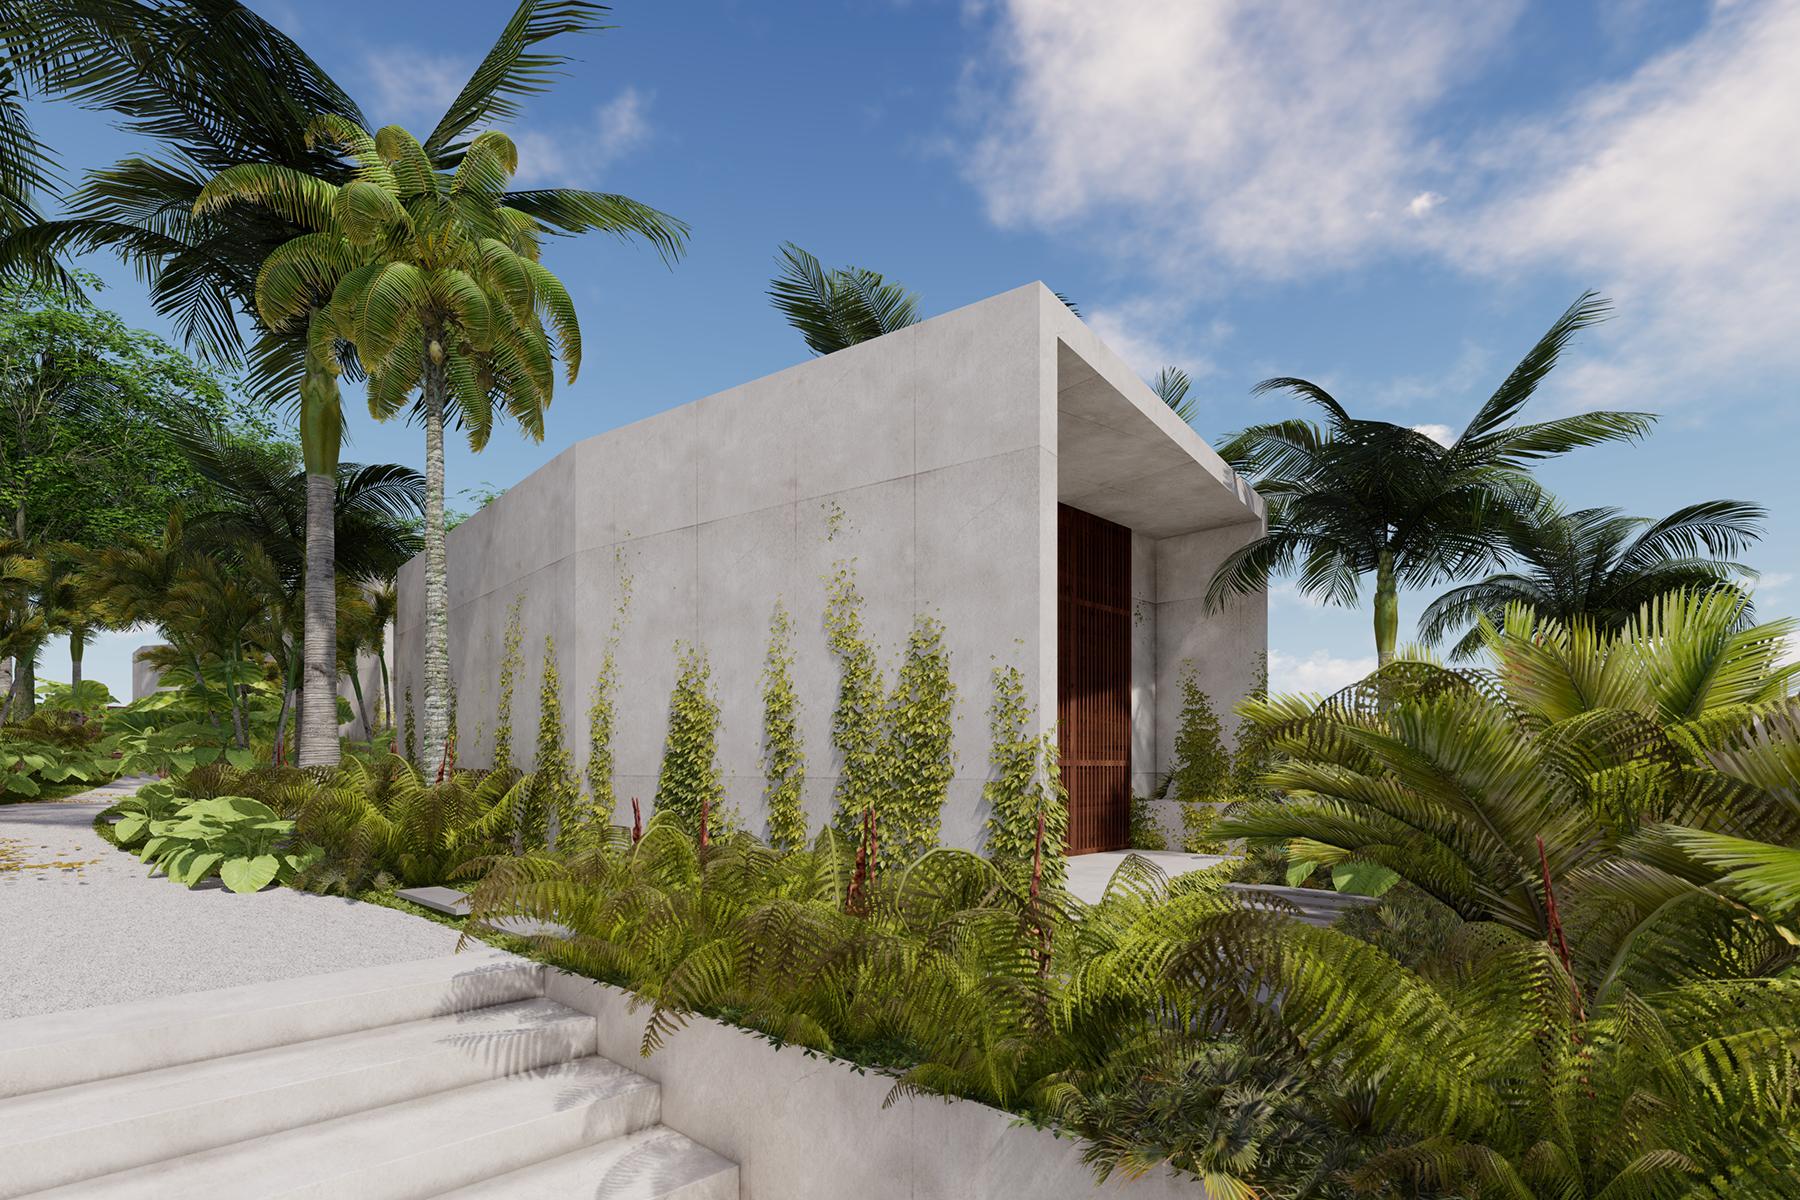 Additional photo for property listing at Pre Venta Casa Cielo Lote290,SecciónIV Troncones, 멕시코의 도시 40807 멕시코